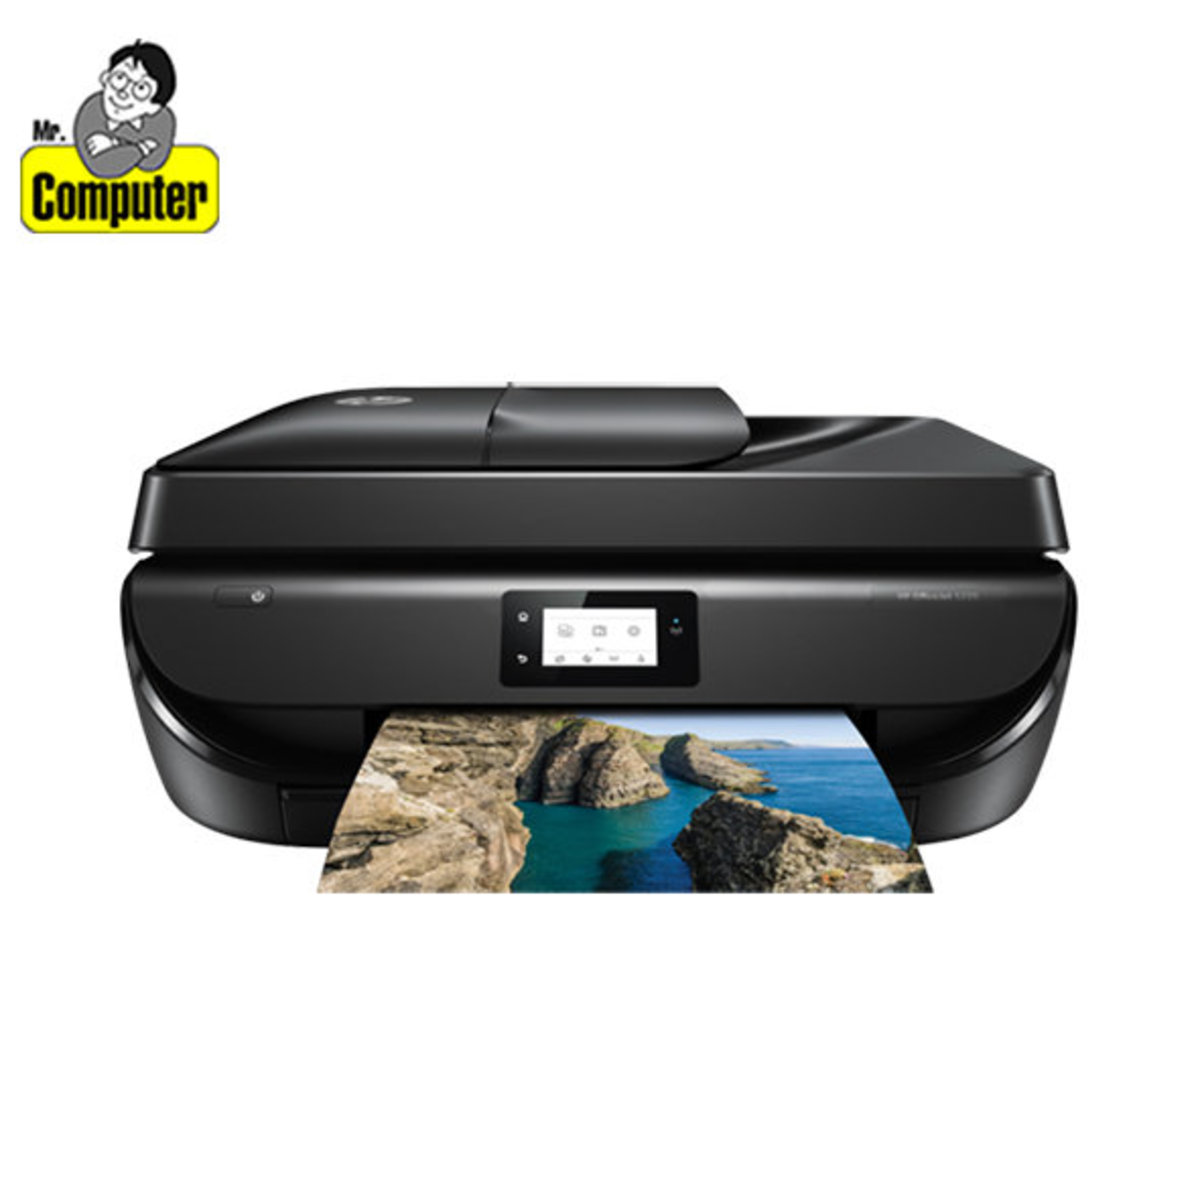 OFFICEJET 5220 4in1 multi-function printer